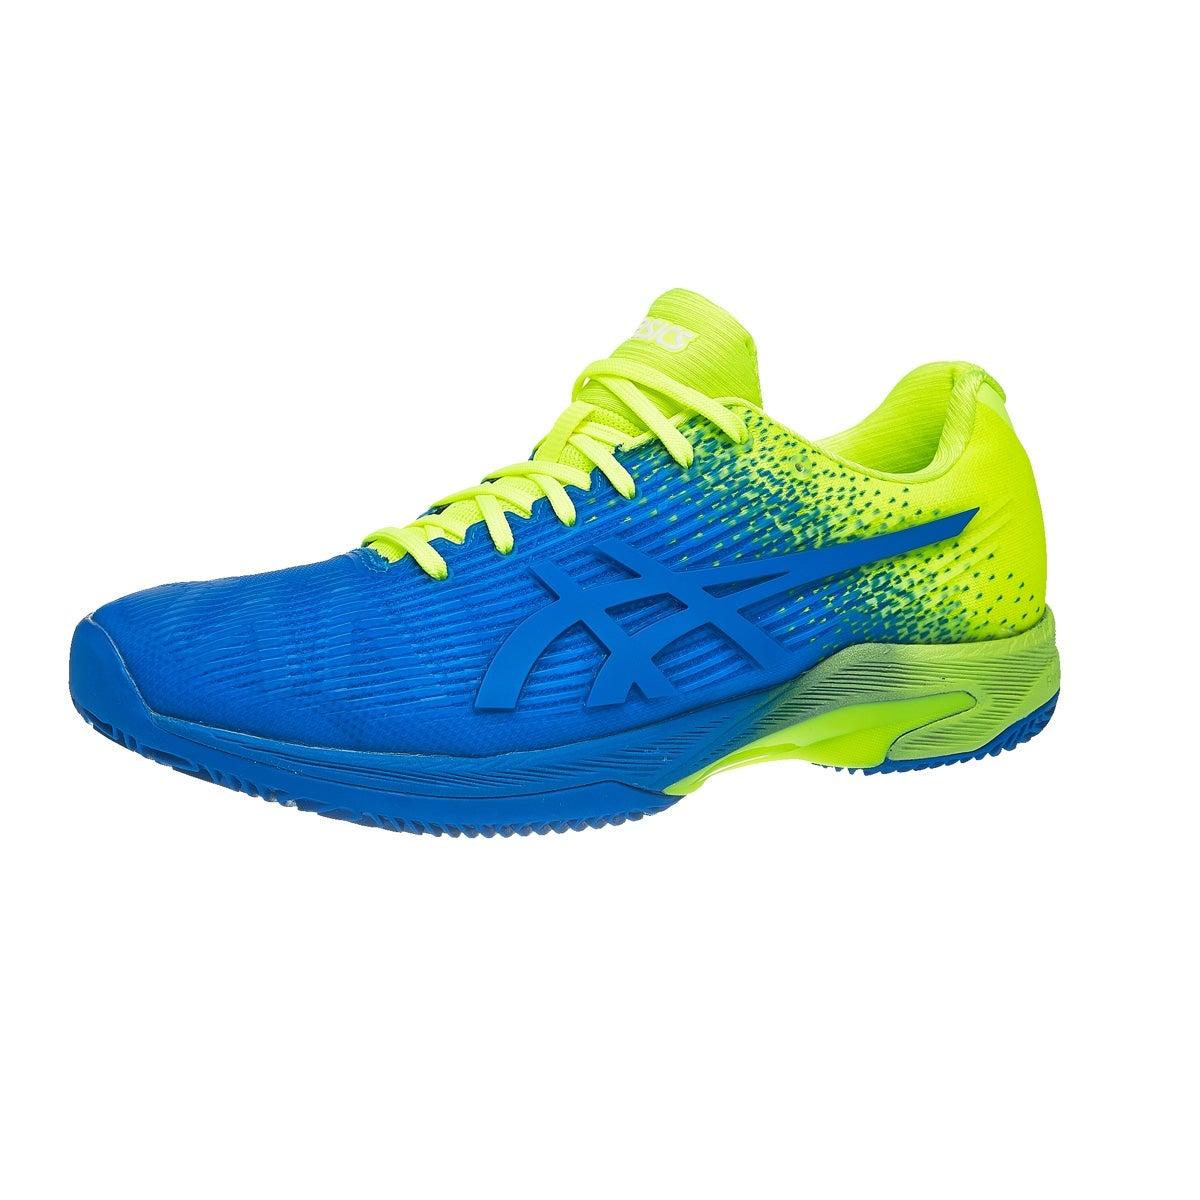 Chaussure Asics Gel 19022 Solution Speed FF ° 360 Bleu/ Jaune Pour Homme Vue à 360 ° af20d3f - kyomin.website